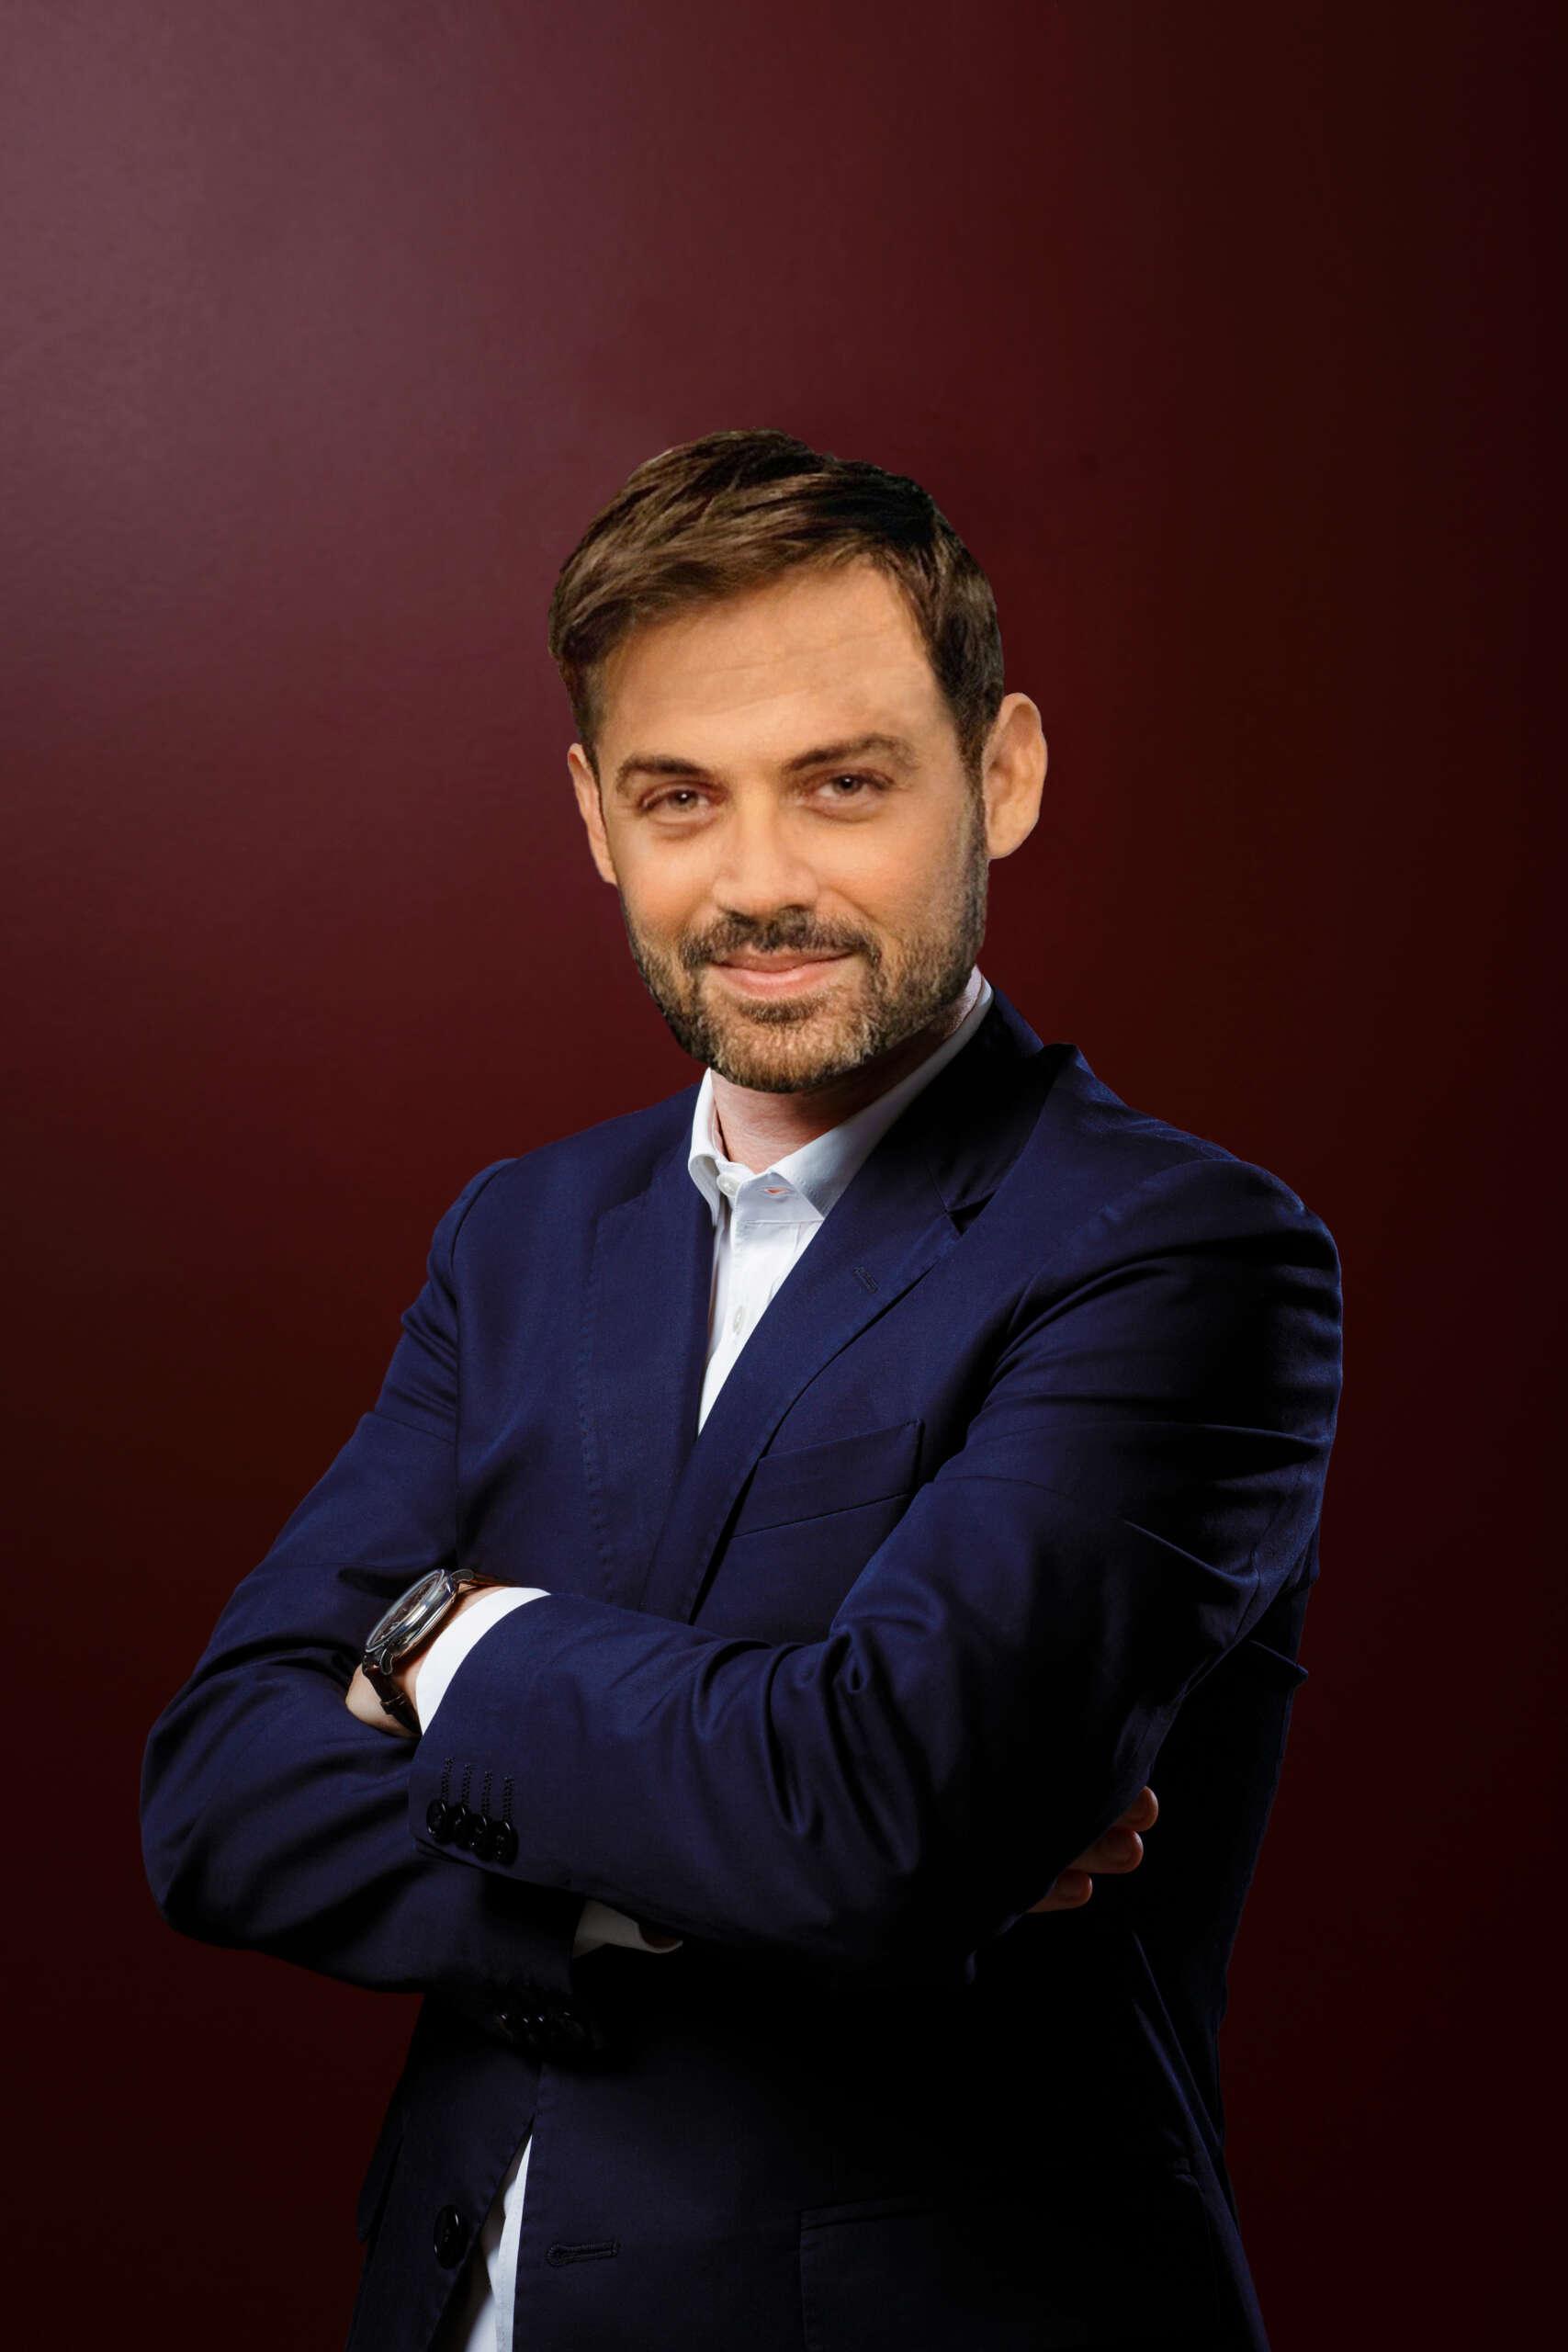 Dott. Giuseppe De Rosa